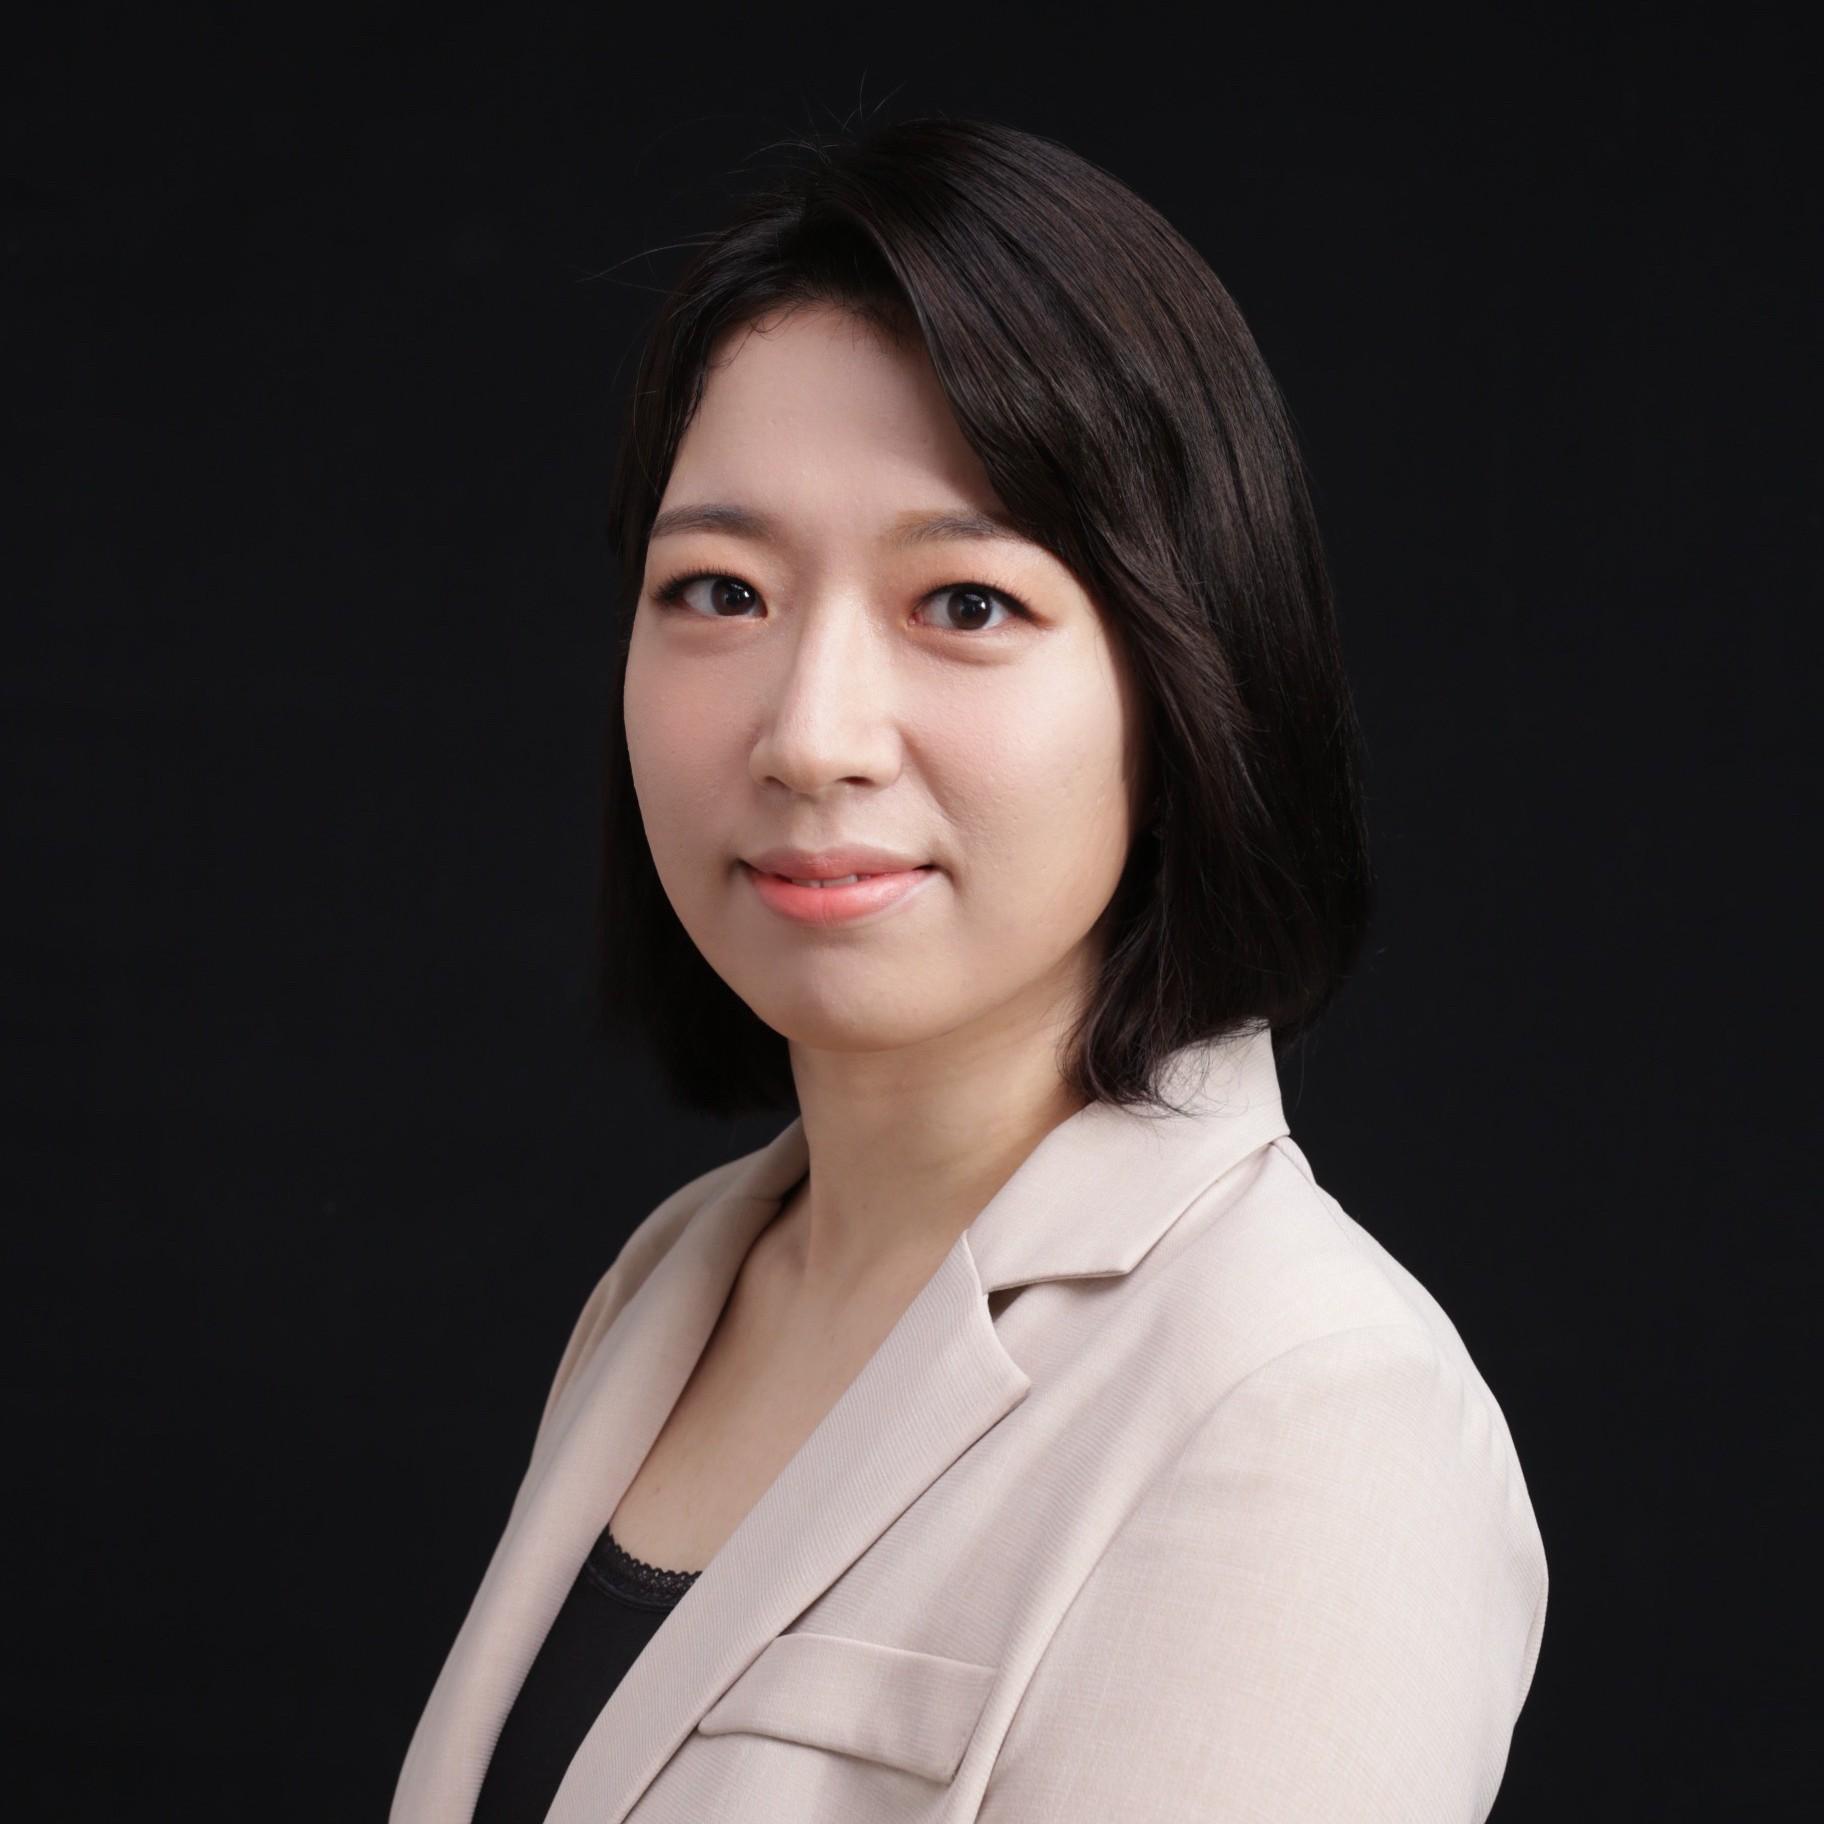 Min Ji Koo